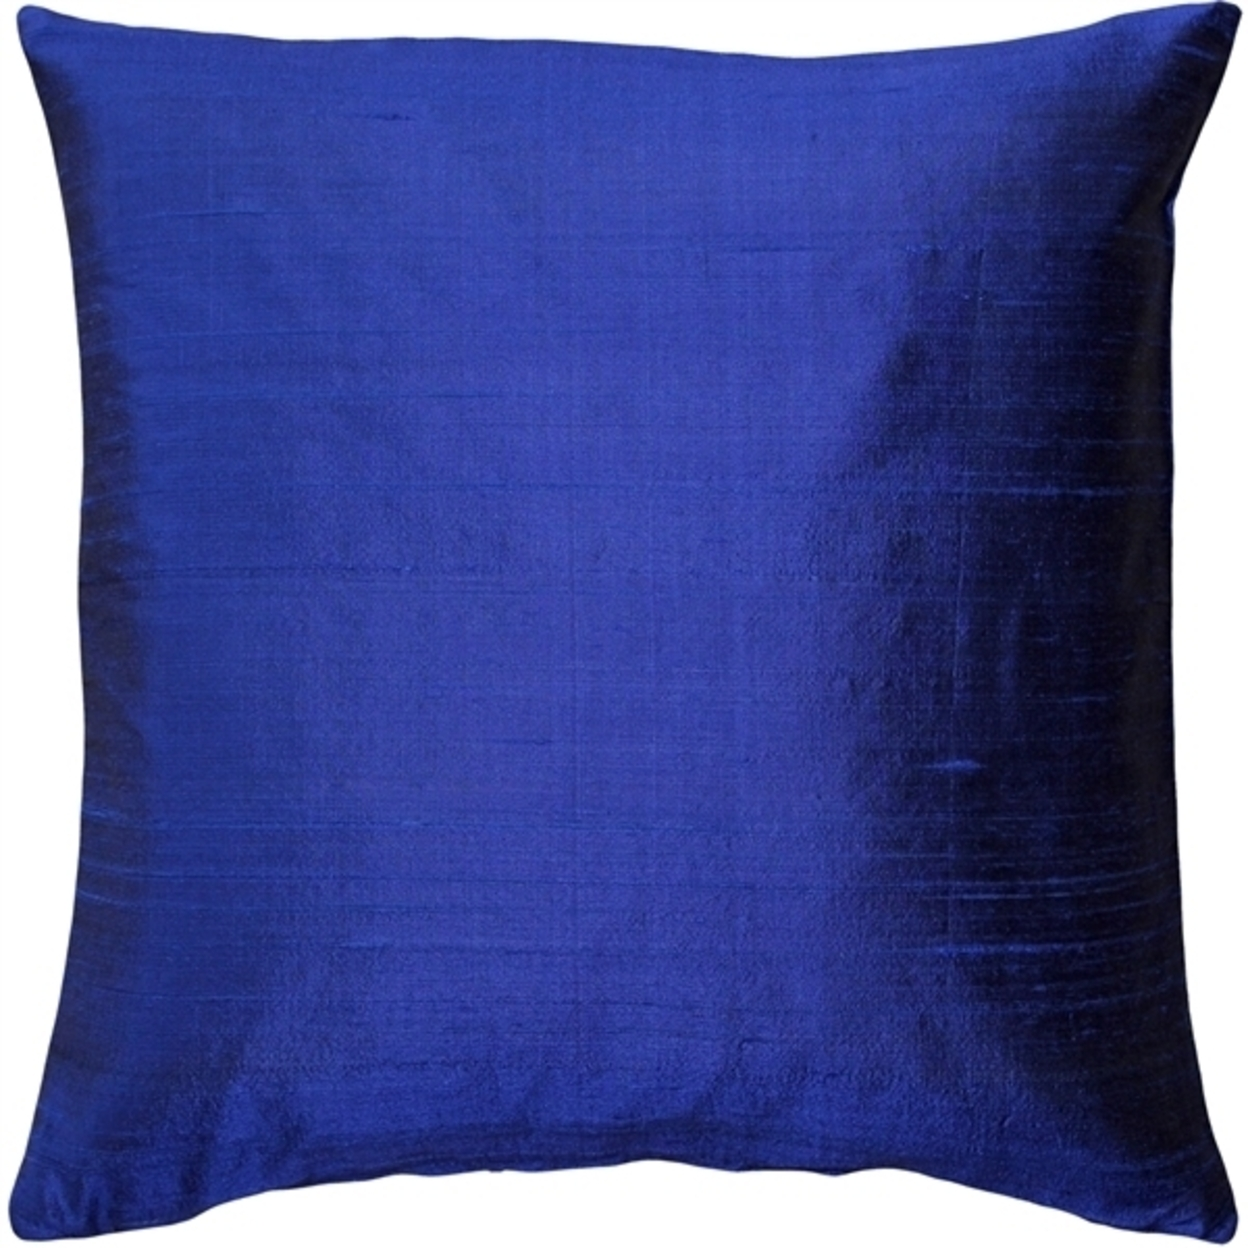 Pillow Decor - Sankara Ink Blue Silk Throw Pillow 18x18 56578f59a3771c8b498bcbc2